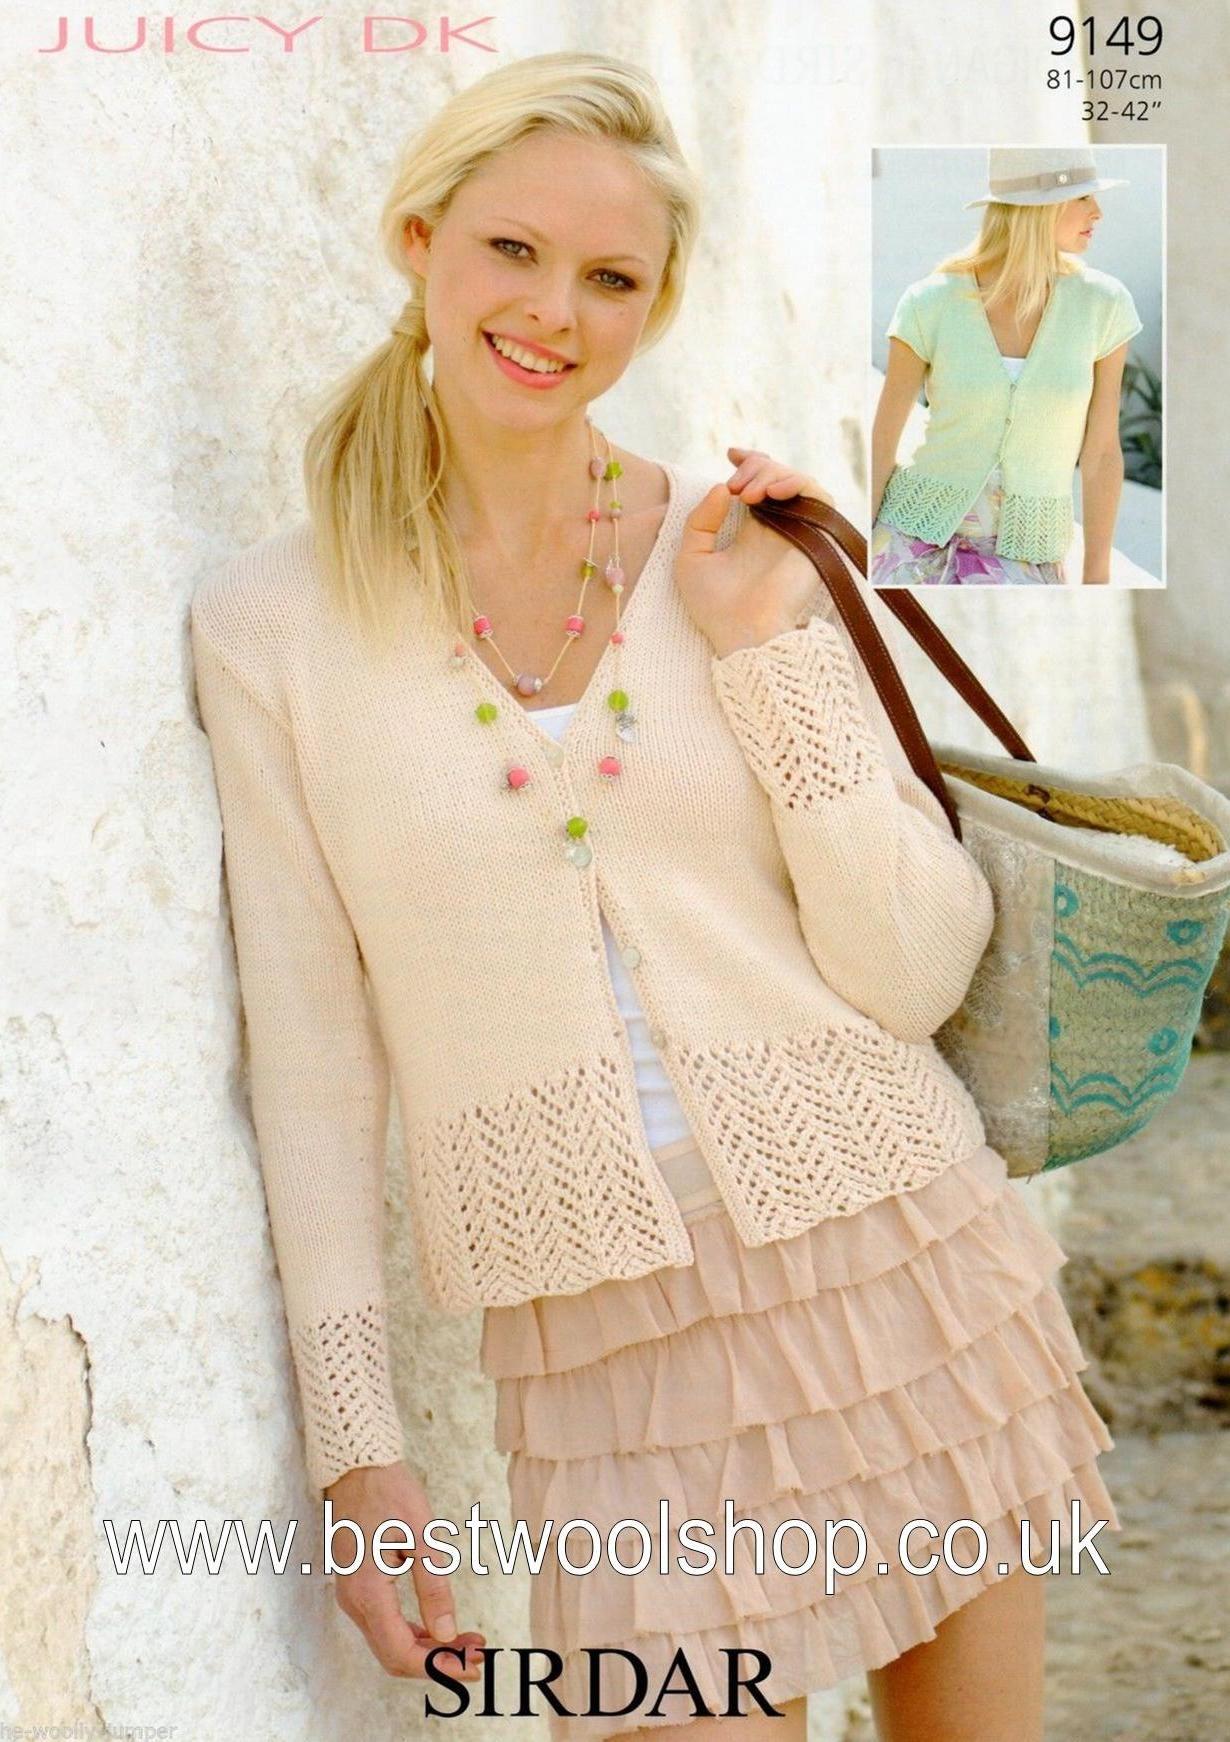 Sirdar Knitting Patterns 9149 - sirdar juicy dk lacy edged cardigan knitting pattern - to fit ygodyum